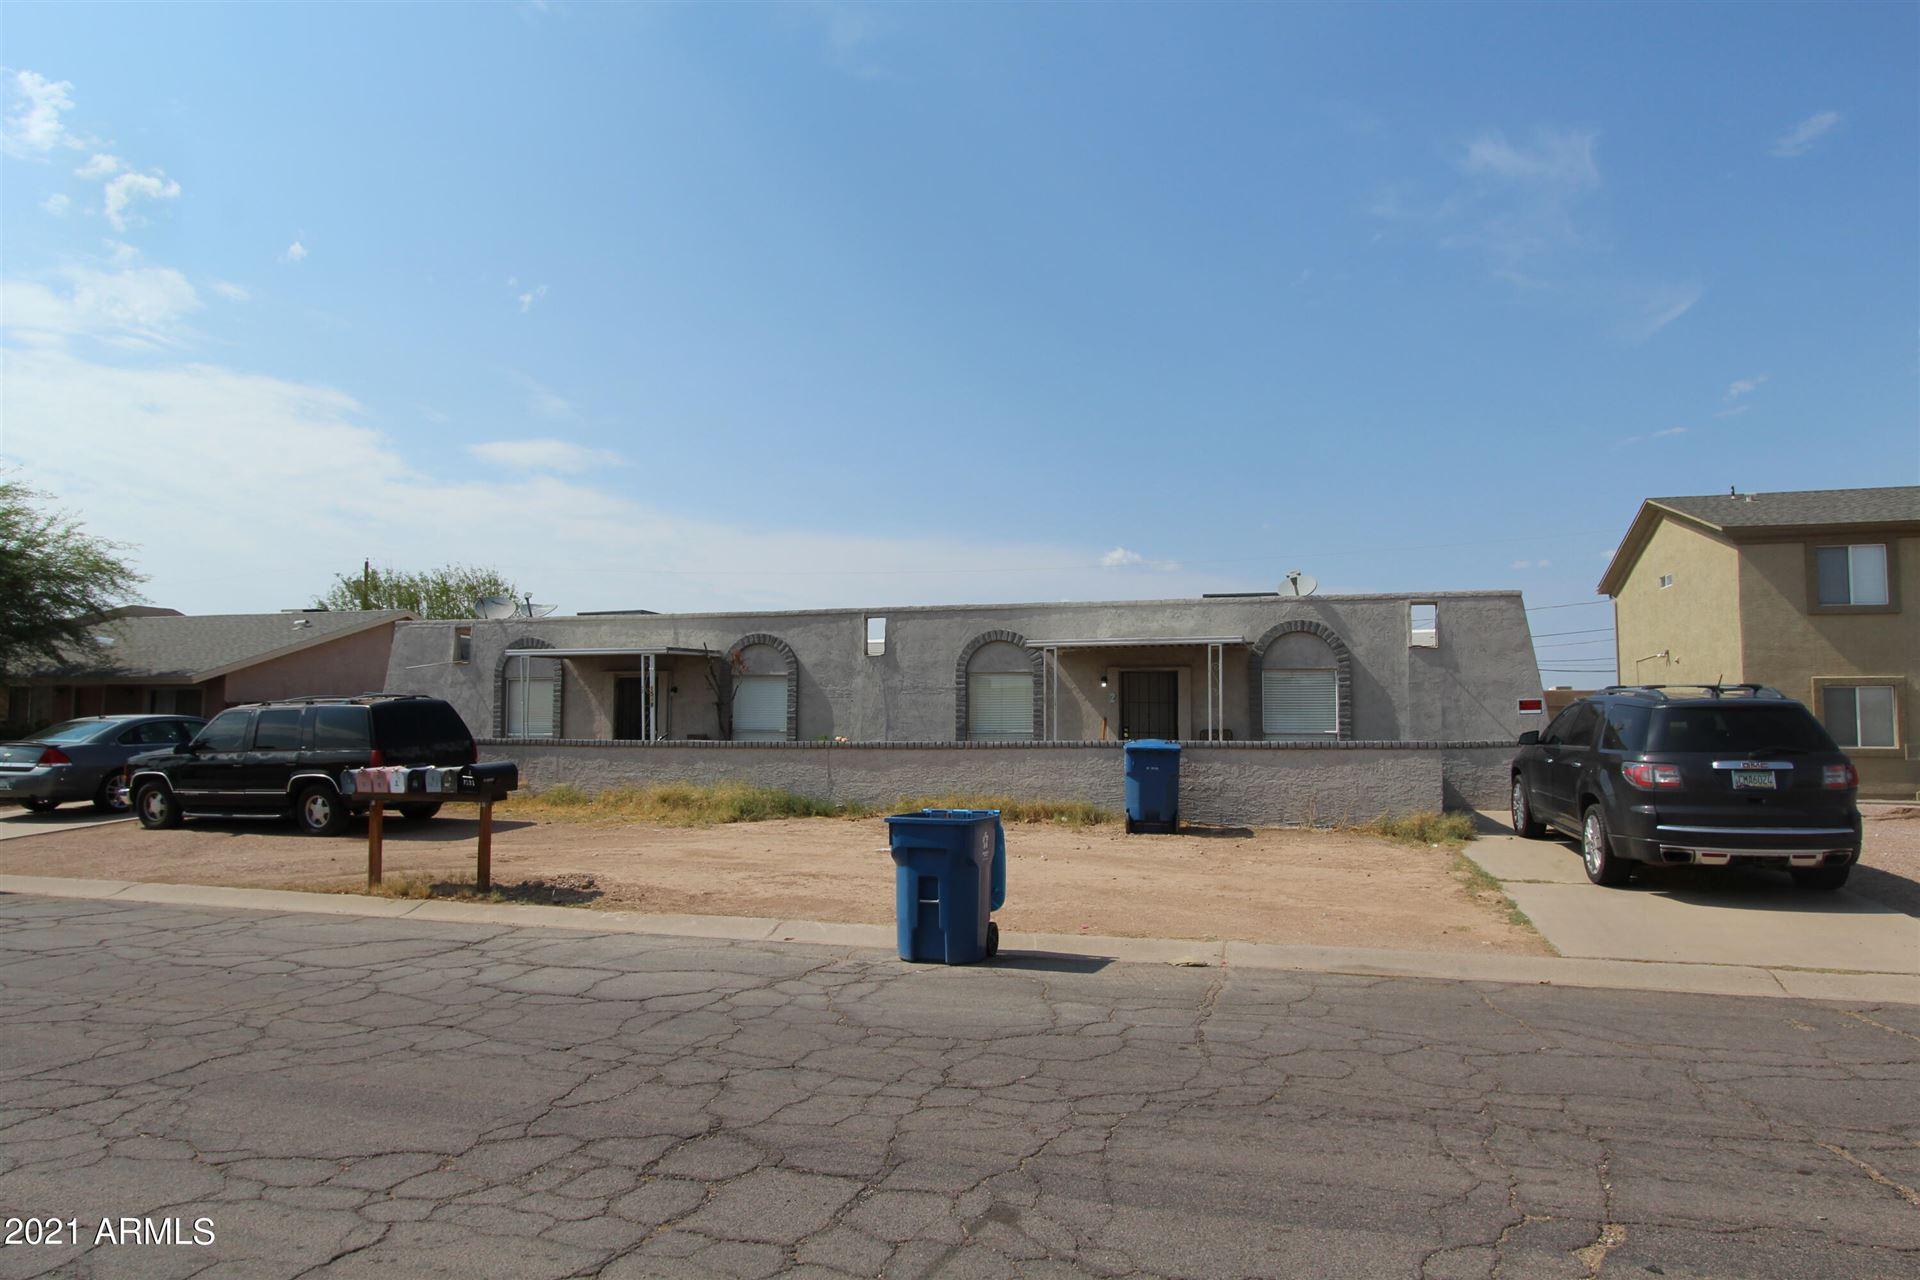 1548 E 28th Avenue, Apache Junction, AZ 85119 - #: 6267918